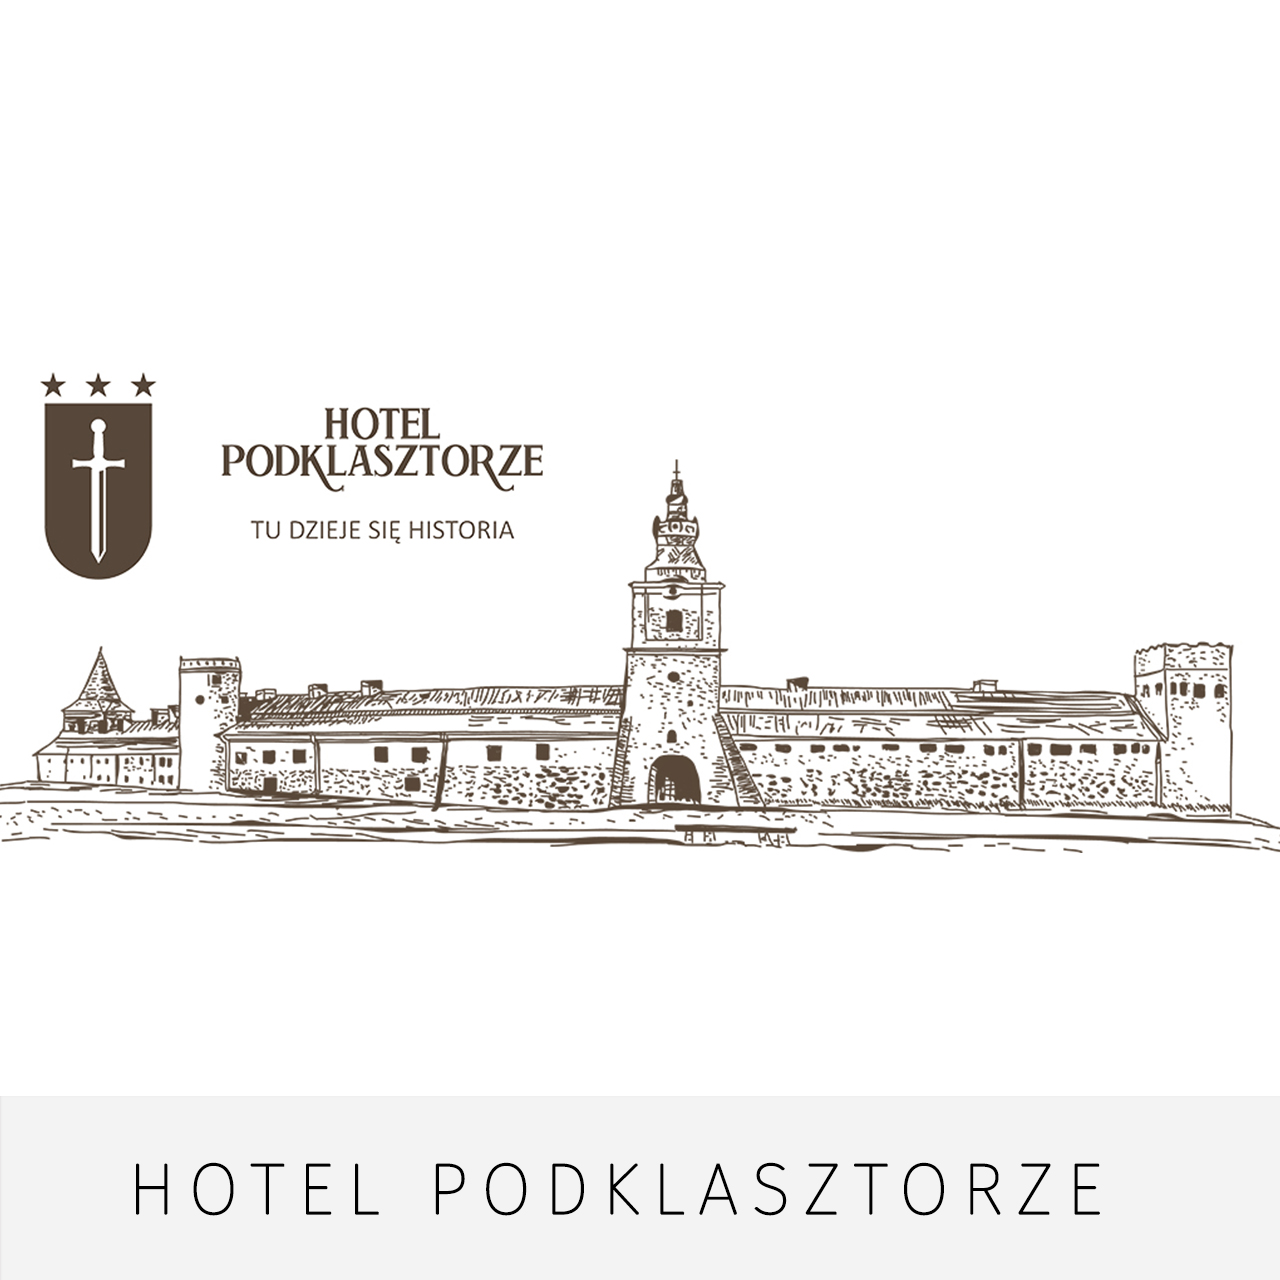 http://hotelpodklasztorze.pl